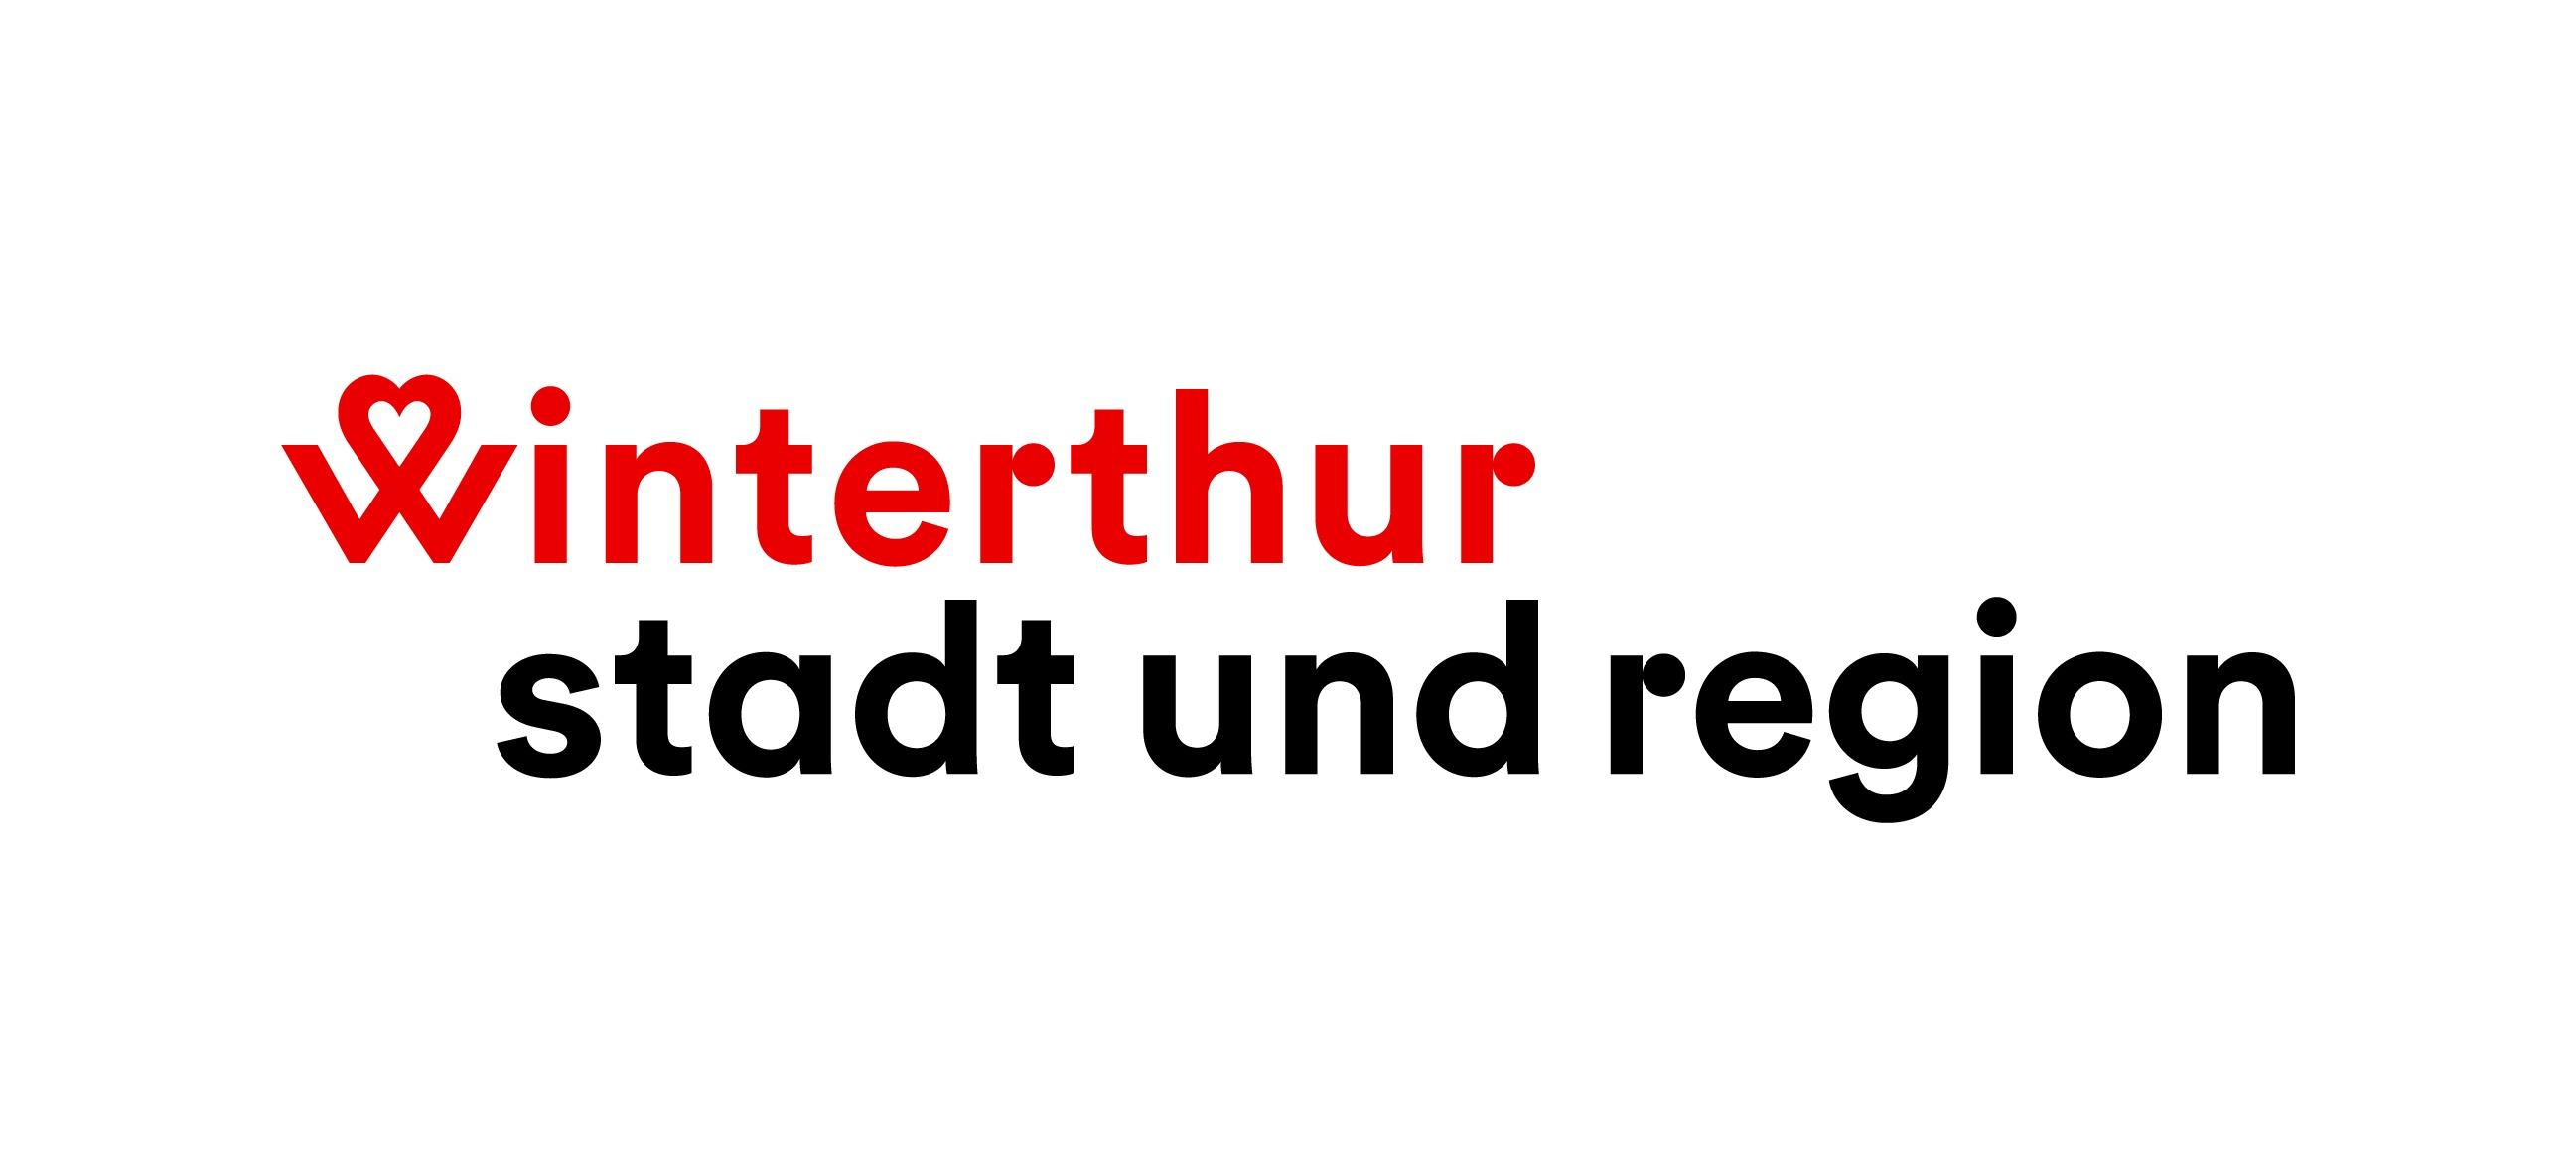 winterthur_stadt_region_rgb